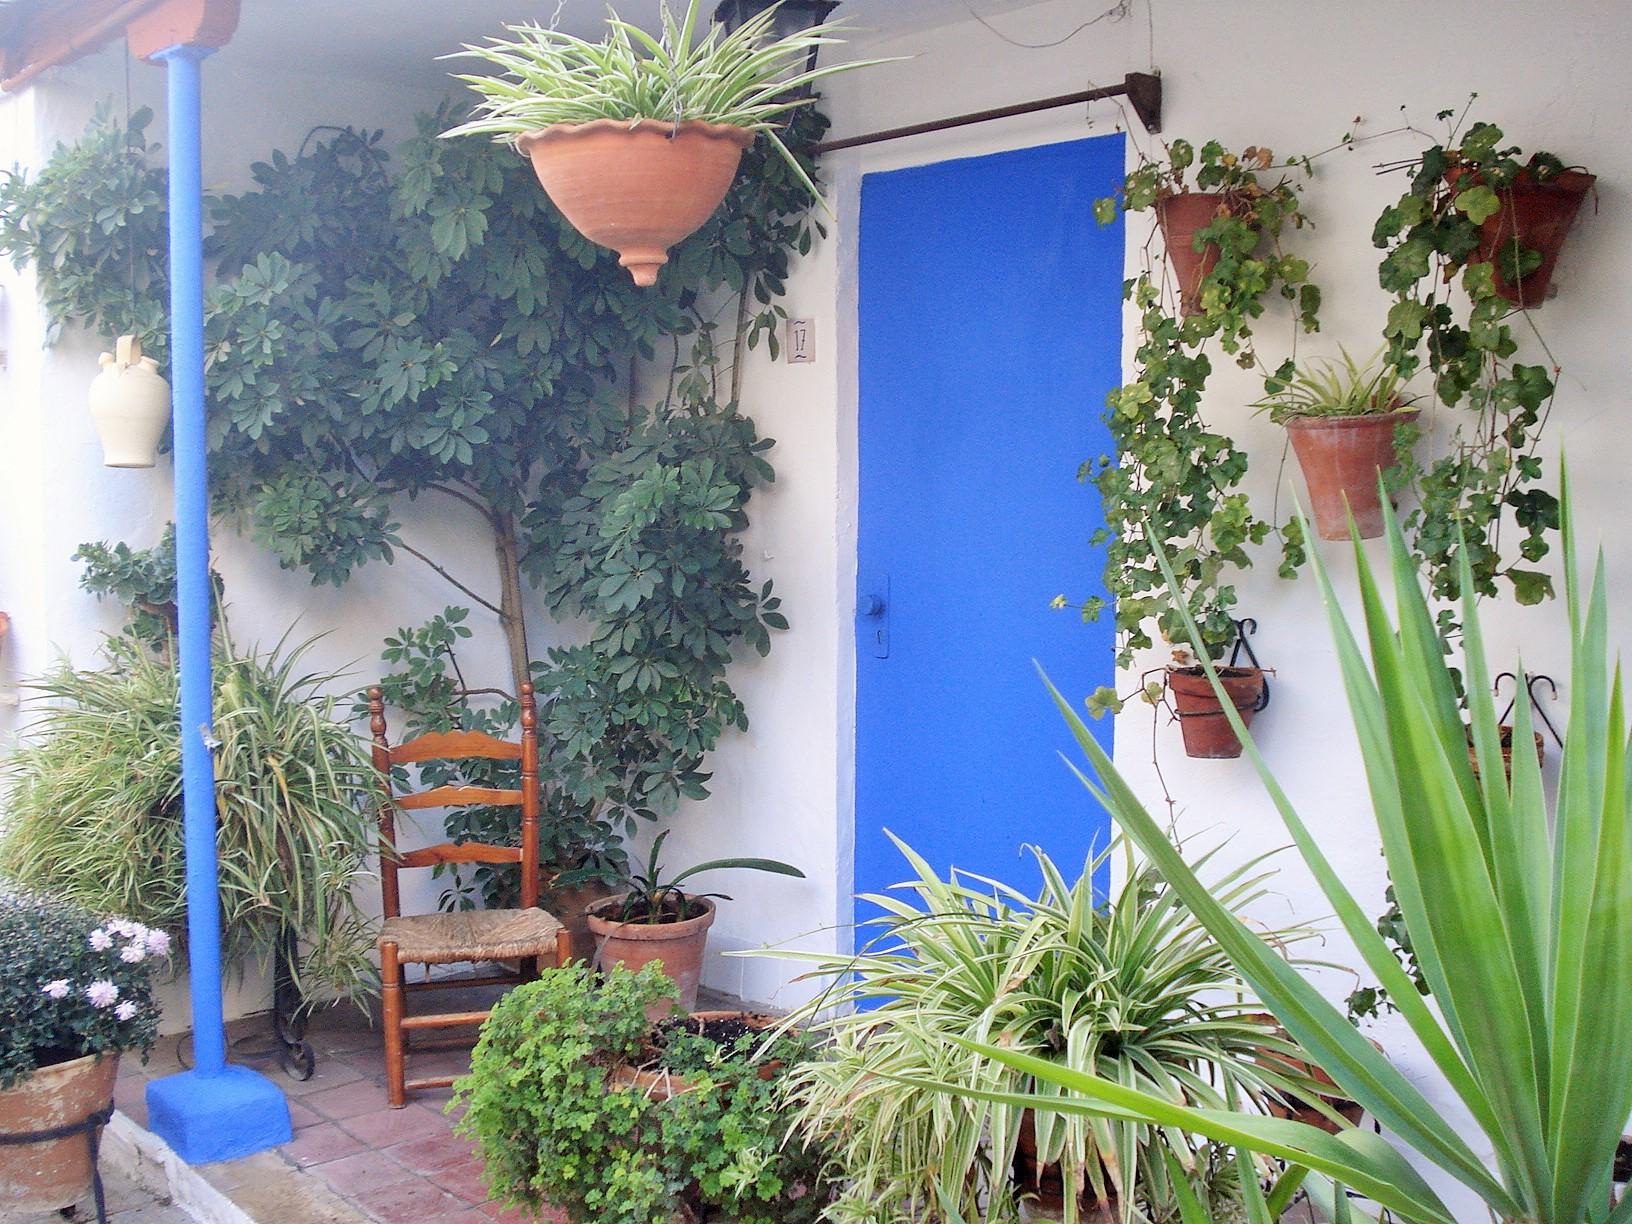 Casa Del Patio In Cordoba Vertical Container Gardening